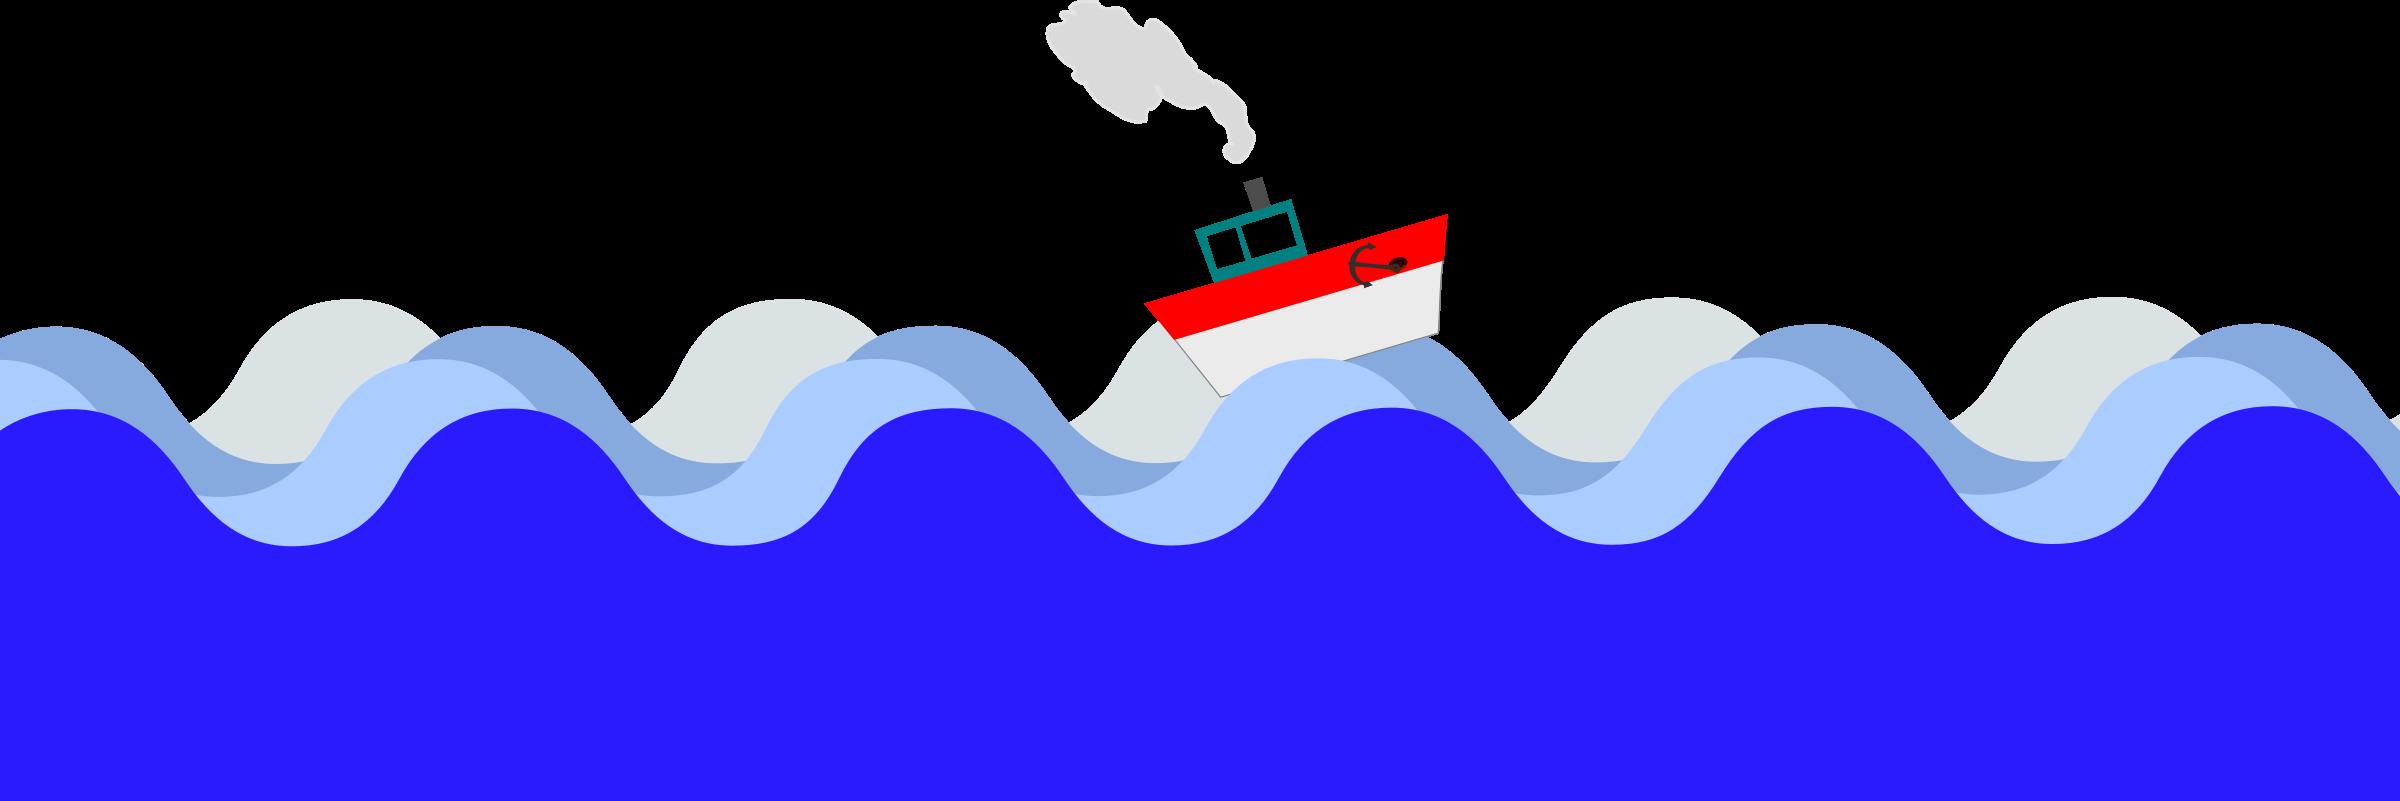 Sea clipart Sea sea Clipart boat at